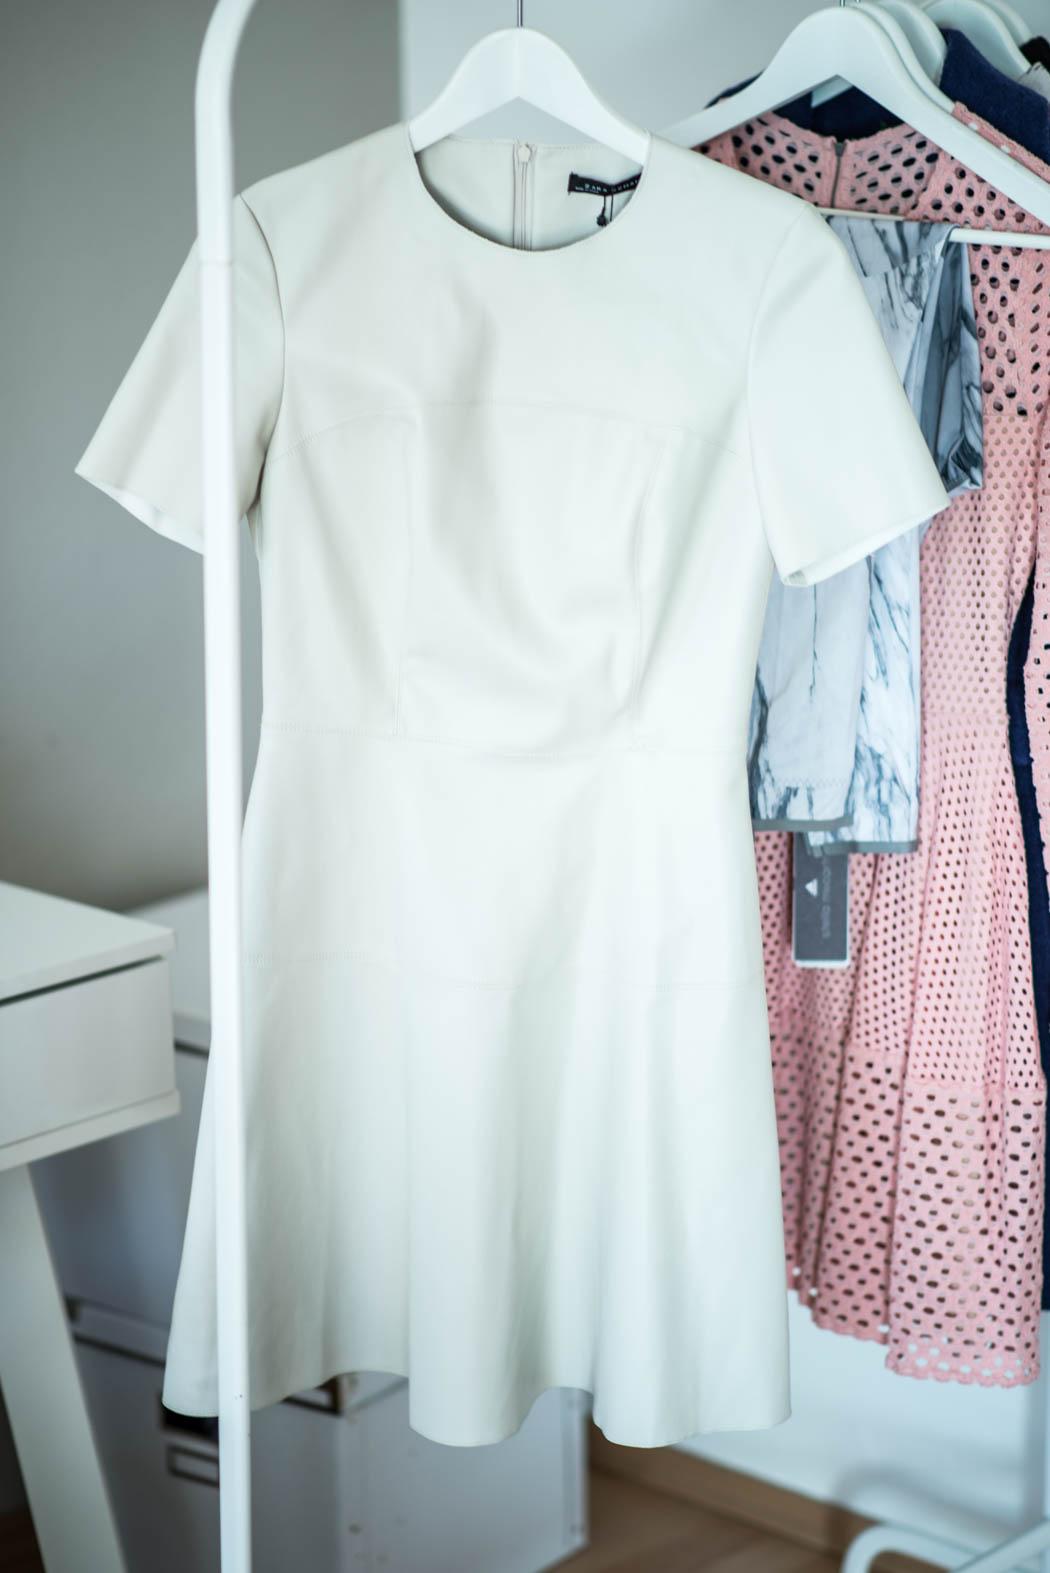 Shoppinghaul-Lindarella-Fashionblogger-München-Deutschland-Fashionblog-7